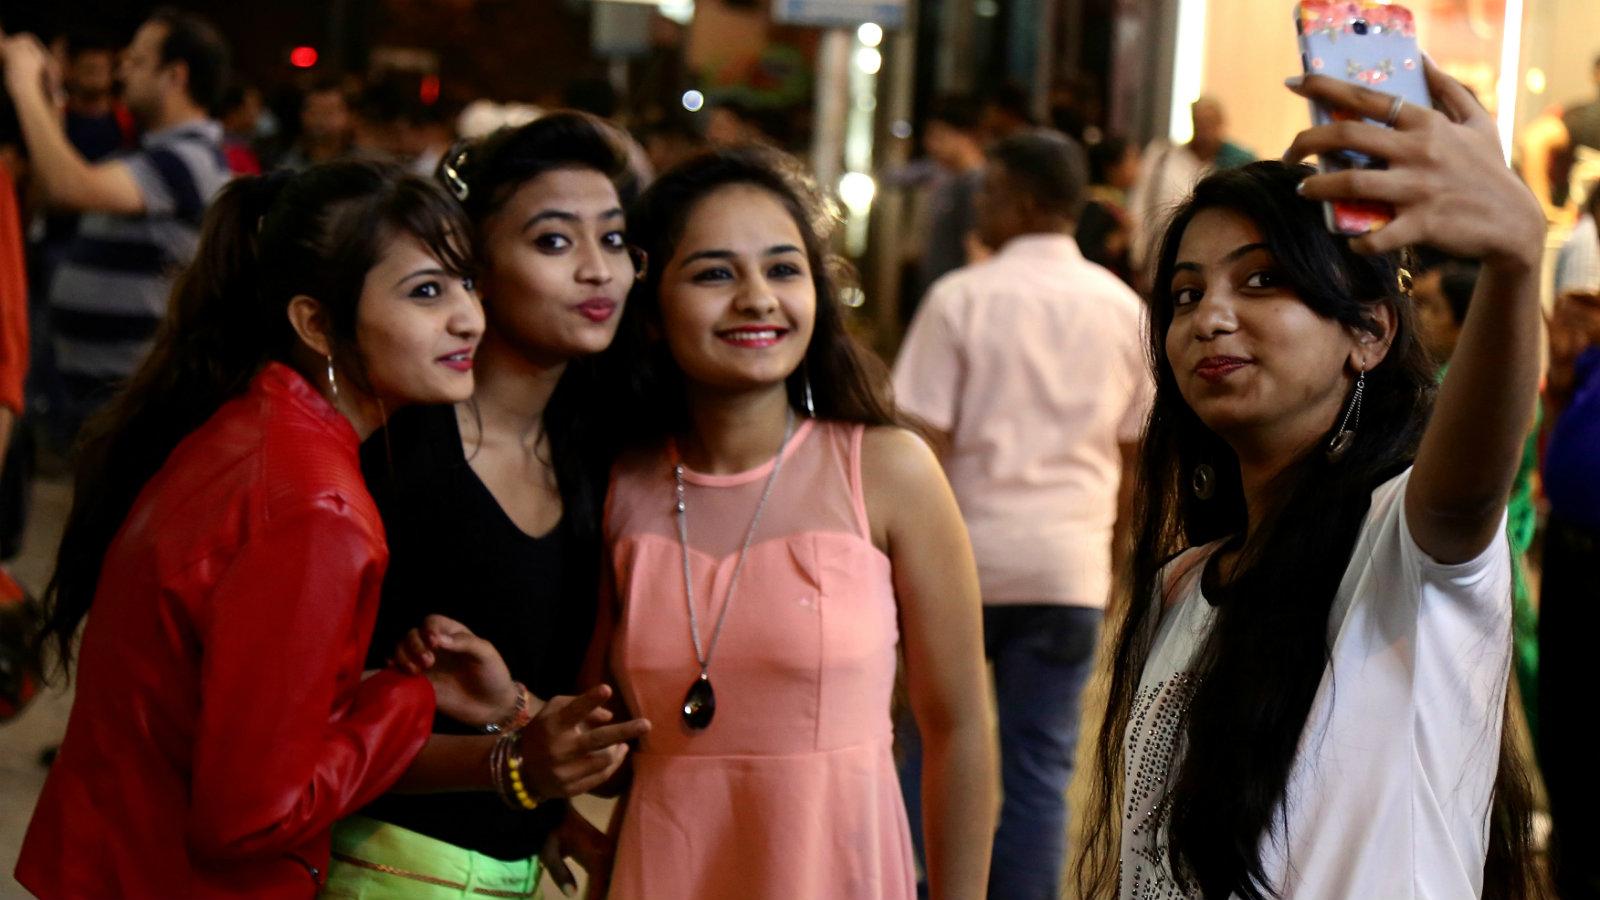 India-urban-poor-shopping-debt-finance